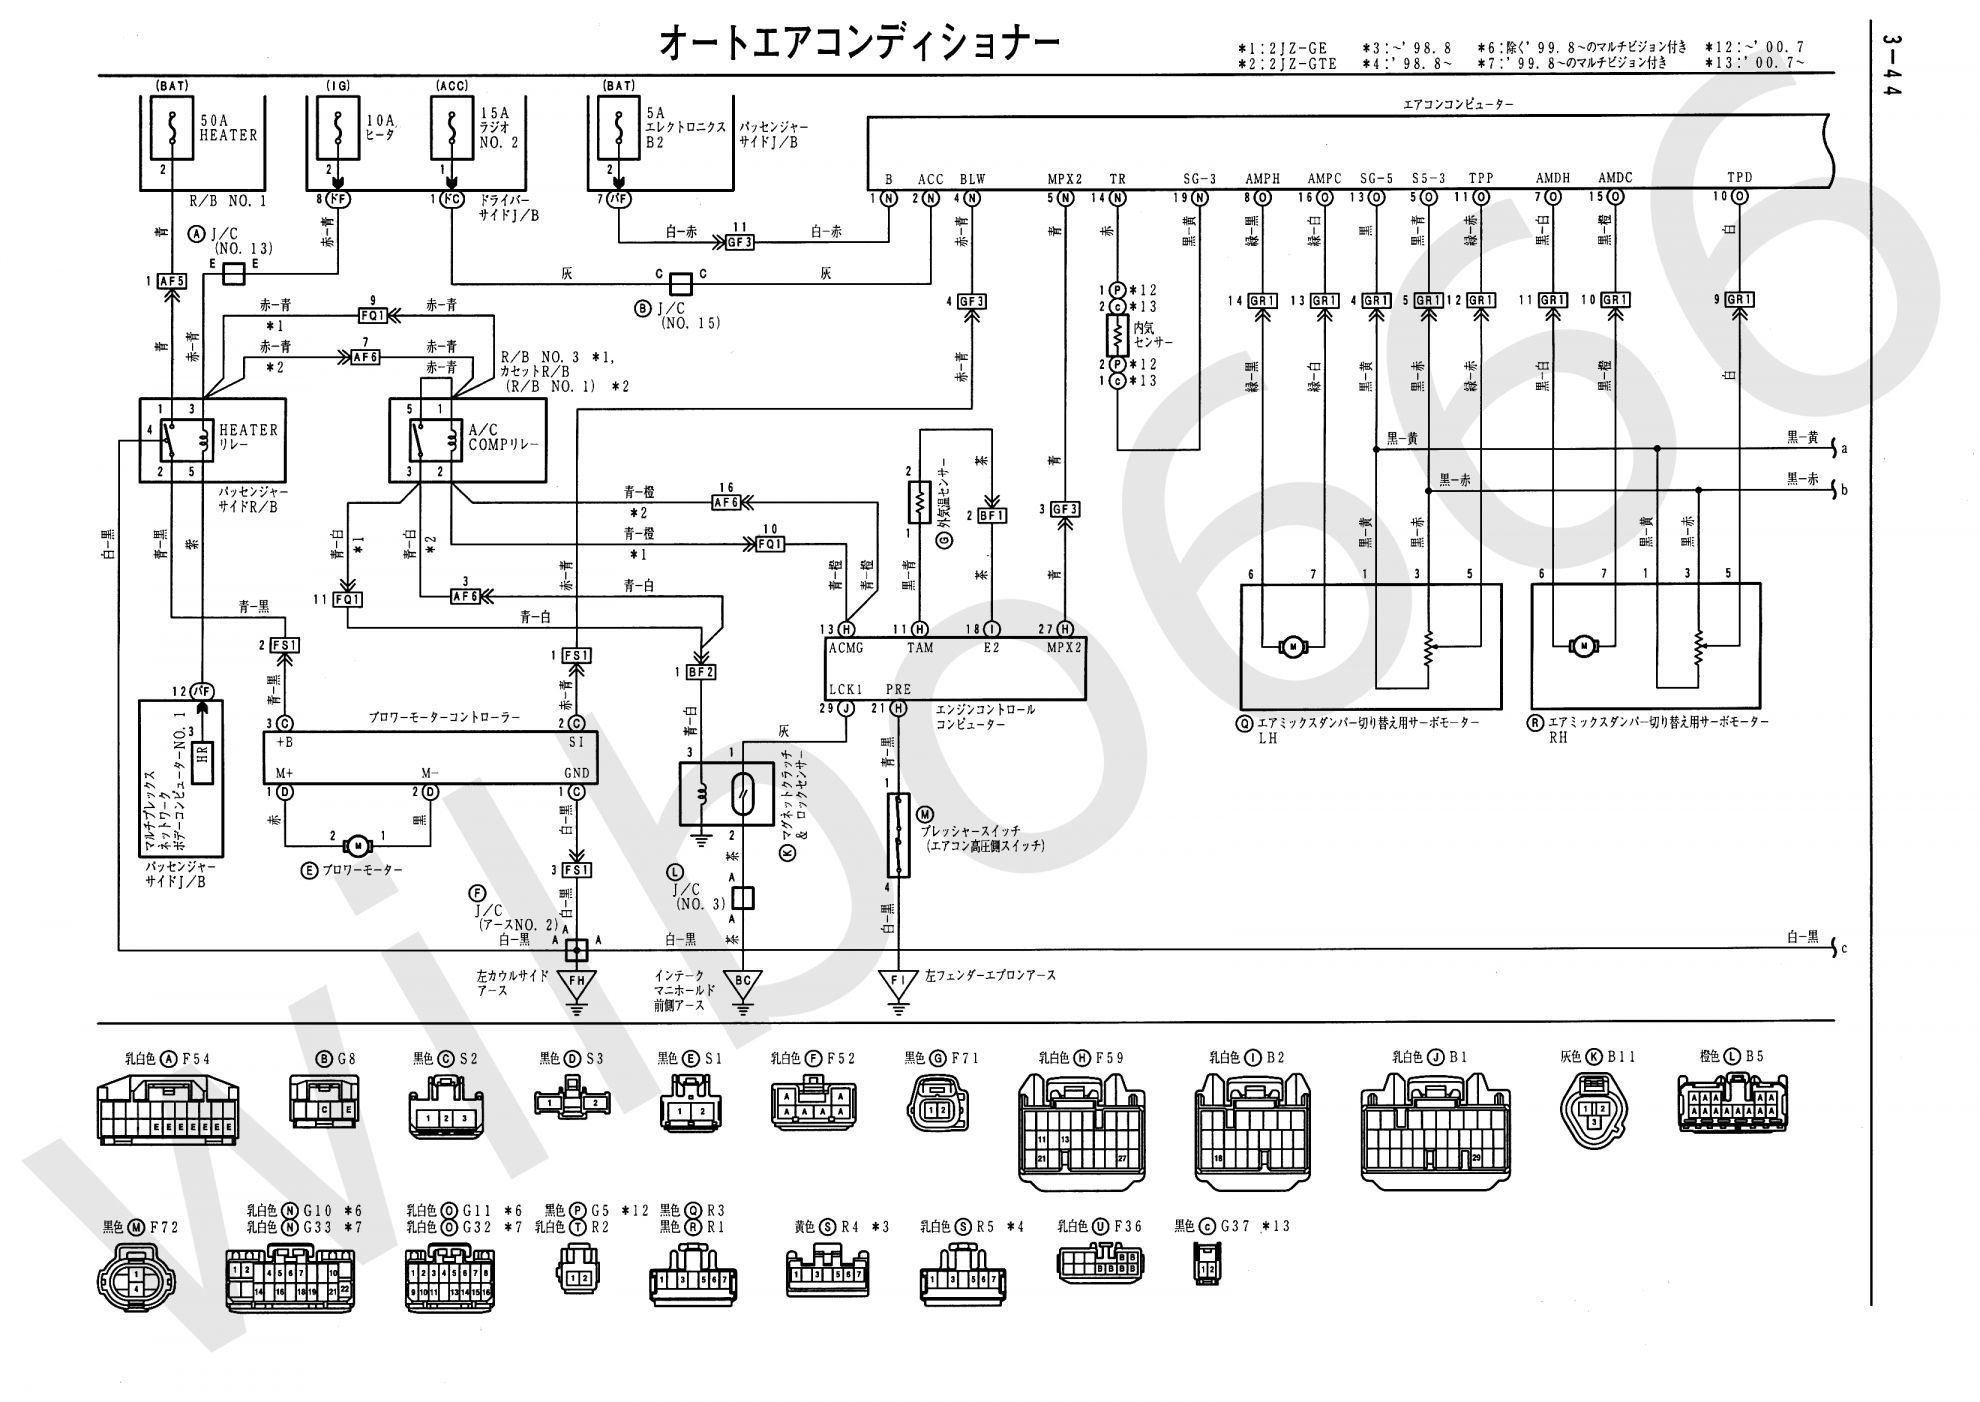 1973 Vw Super Beetle Engine Wiring Diagram Schematic And Wiring Diagram In 2020 Vw Super Beetle Diagram Engineering